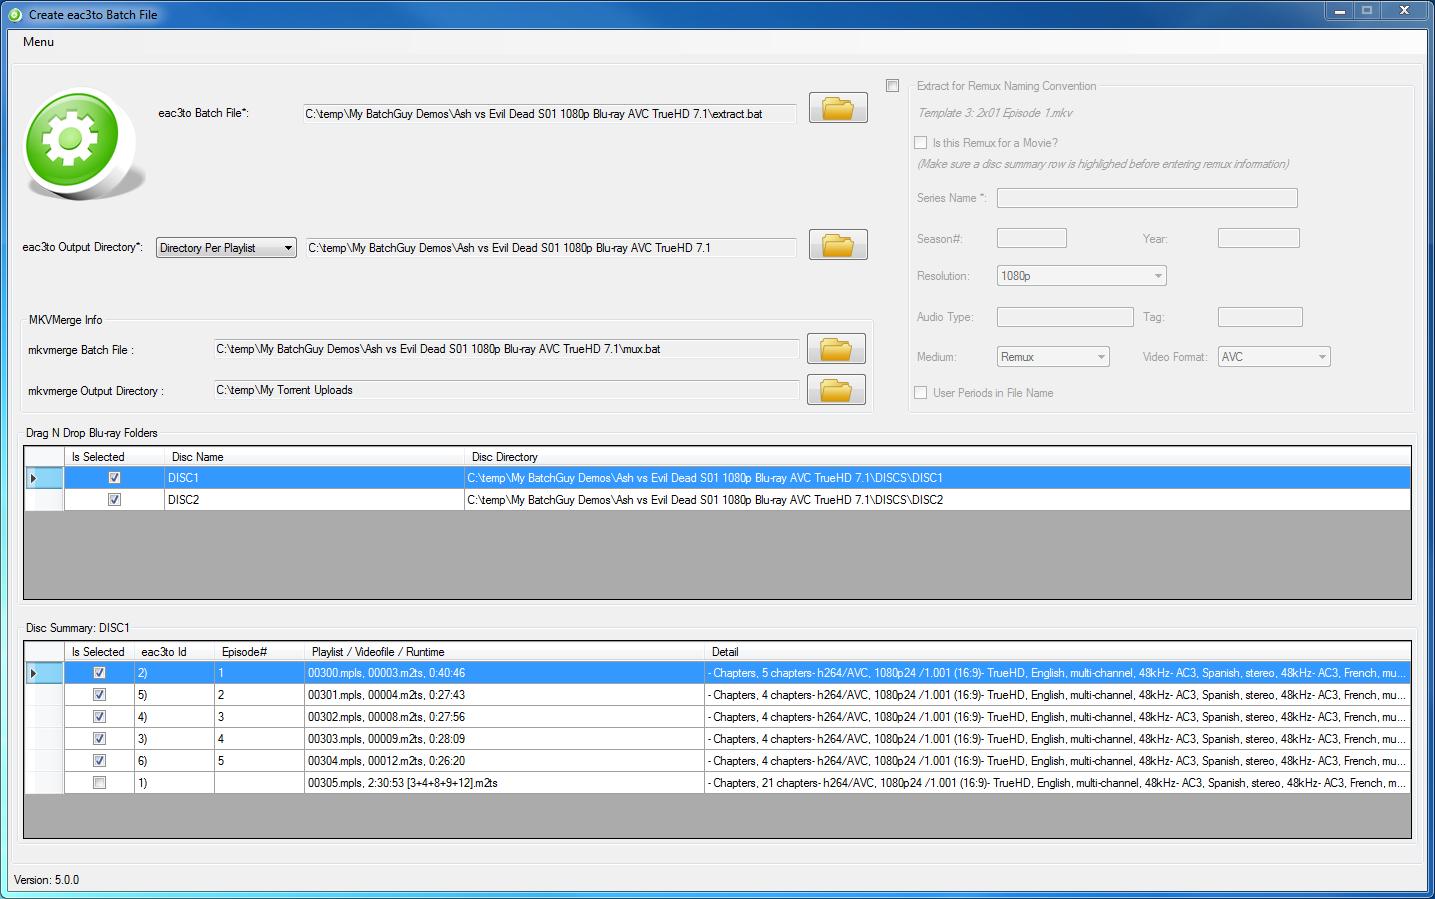 BatchGuy Create eac3to Batch File Screen